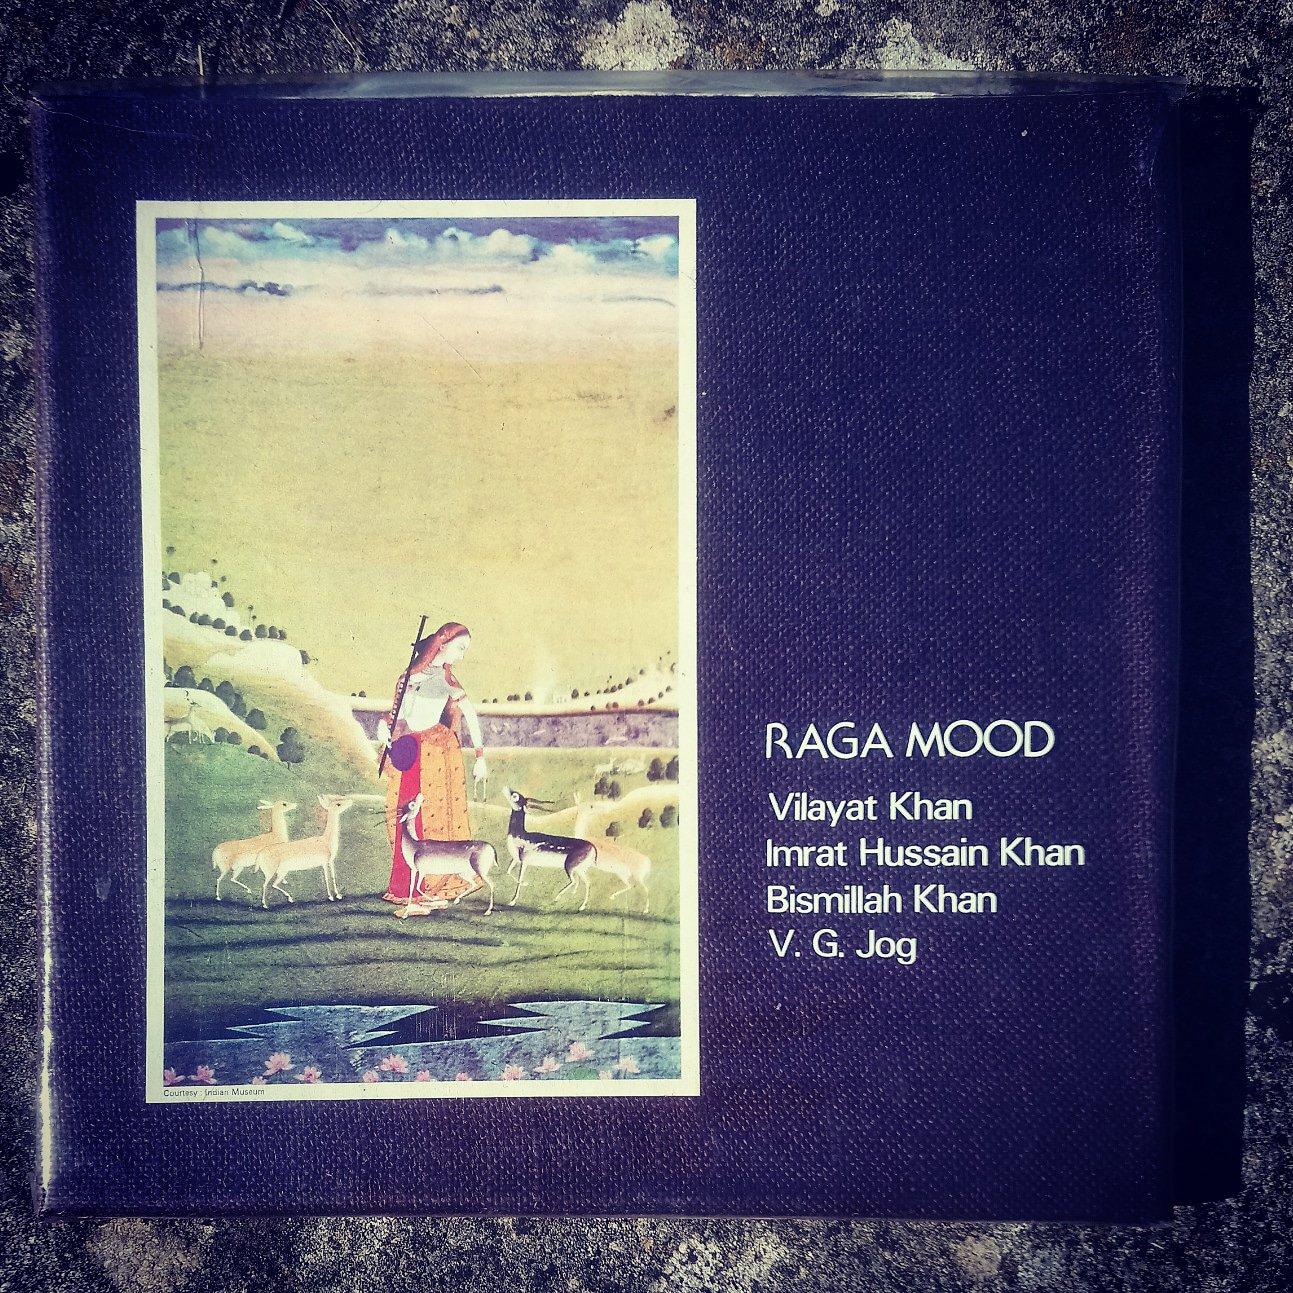 Today's #charityshoprecord... Raga Mood feat. Vilayat Khan, Imrat Hussain Khan, Bismillah Khan and V. G. Jog (EMI, 1982, 3xLP) #raga #indianclassical #hindustani #sitar #violin #shehnai #tabla #jugalbandi #vinyl https://t.co/tDf2G9pD8H